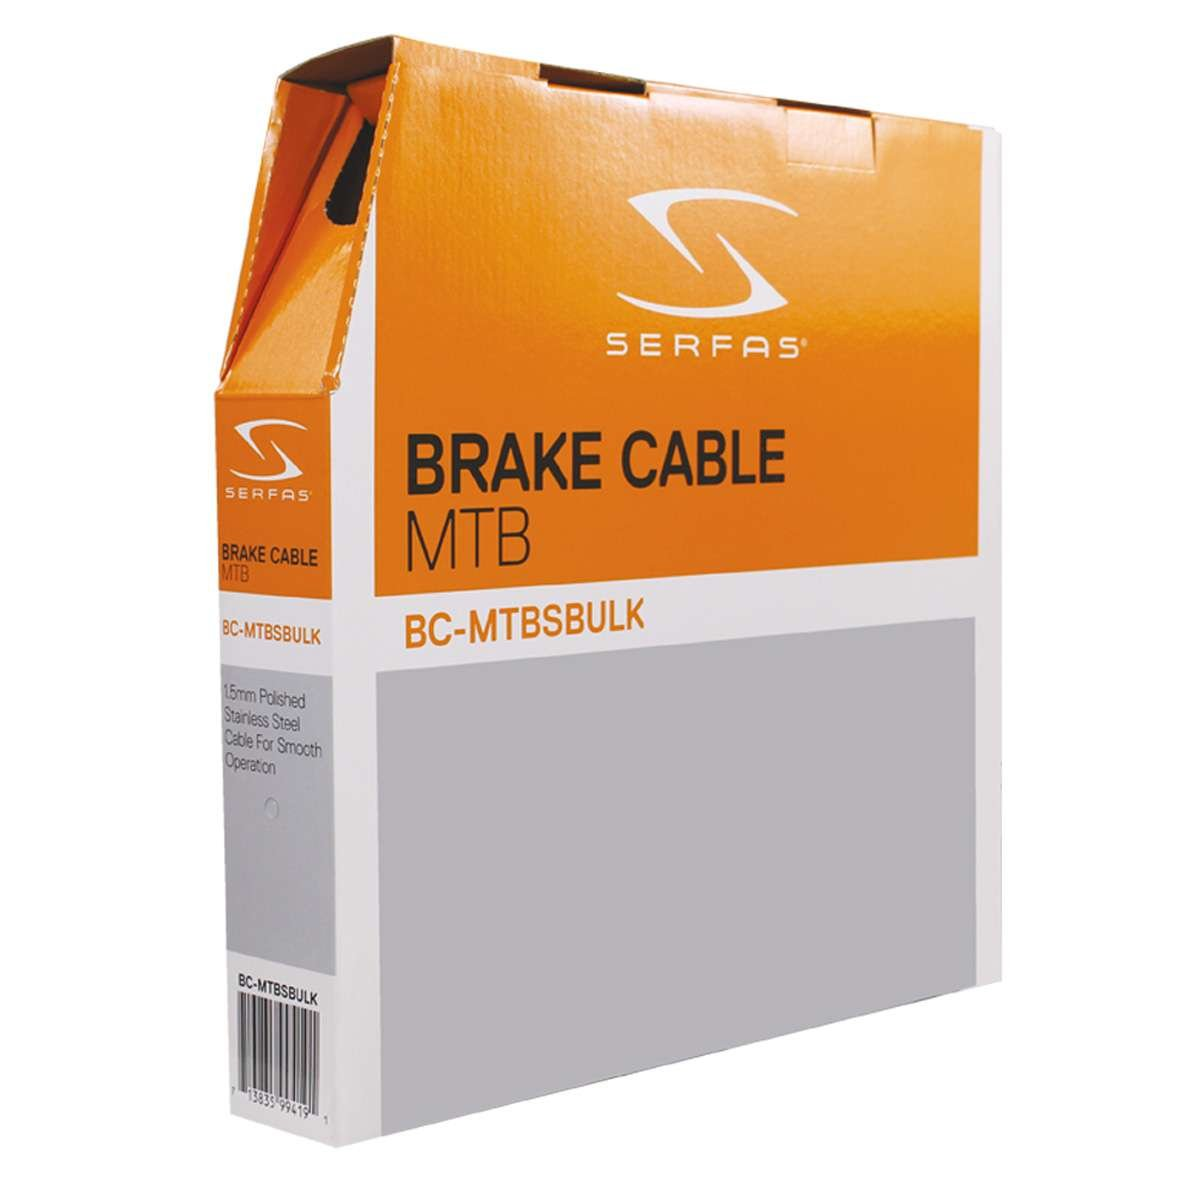 Serfas Mountain Bicycle Stainless Steel Bicycle Brake Cable - Bulk Box - BC-MTBSBULK